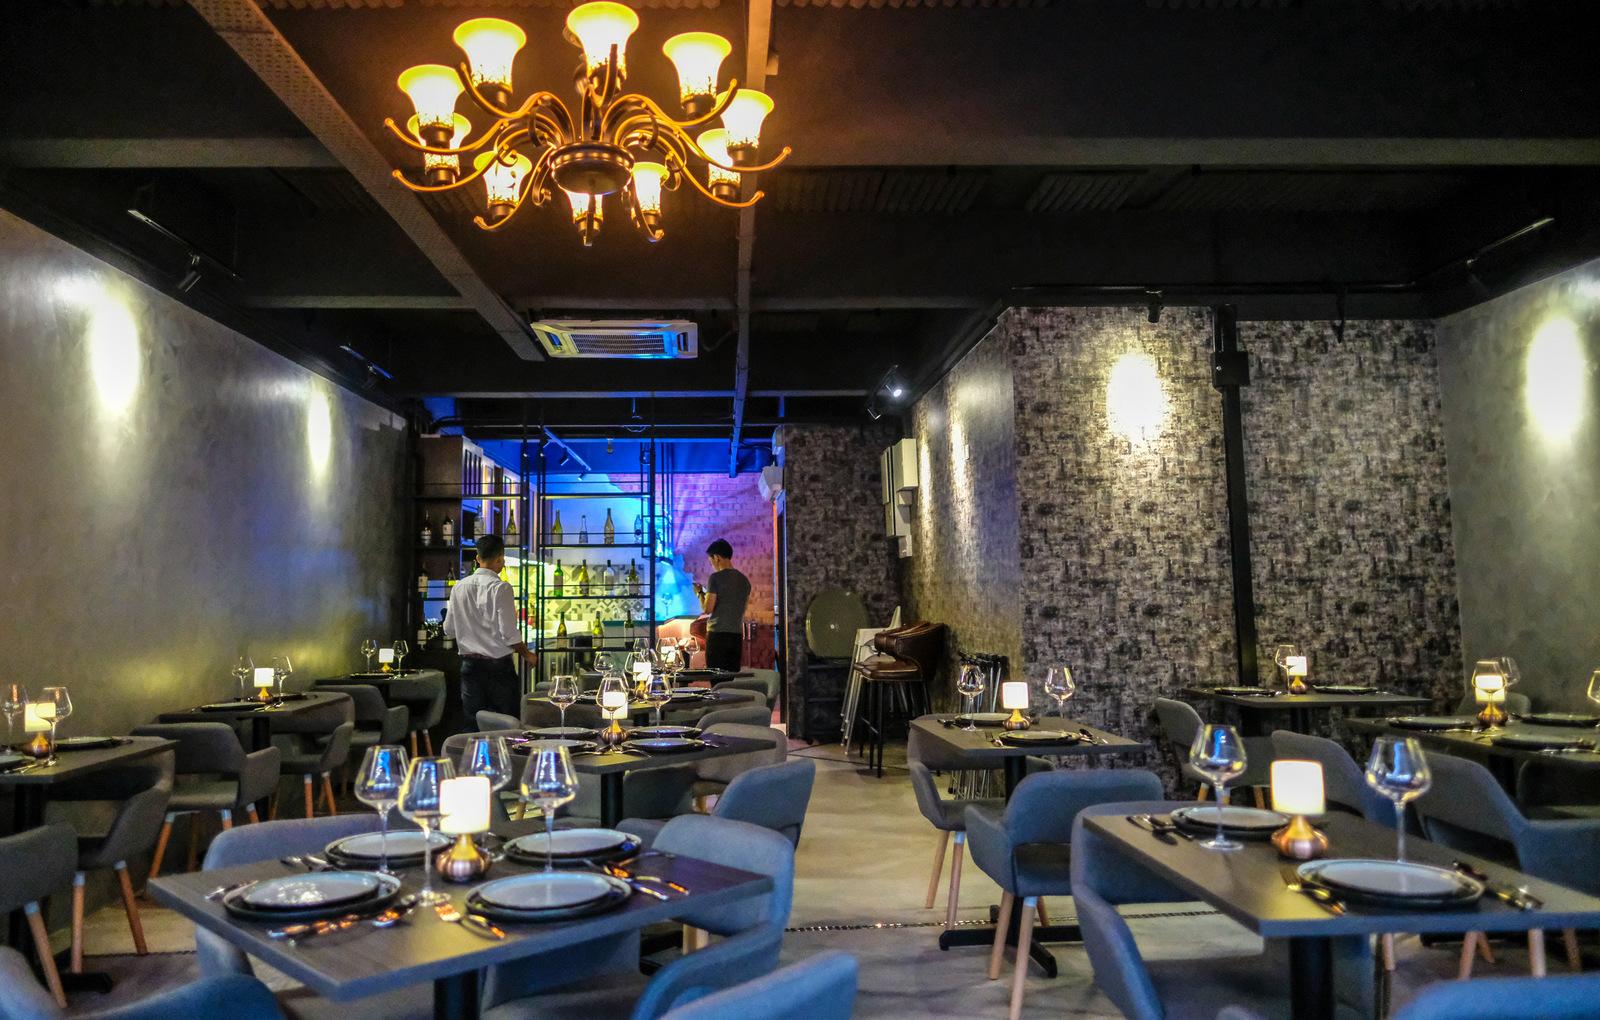 kara conceptual french cuisine, kota damansara